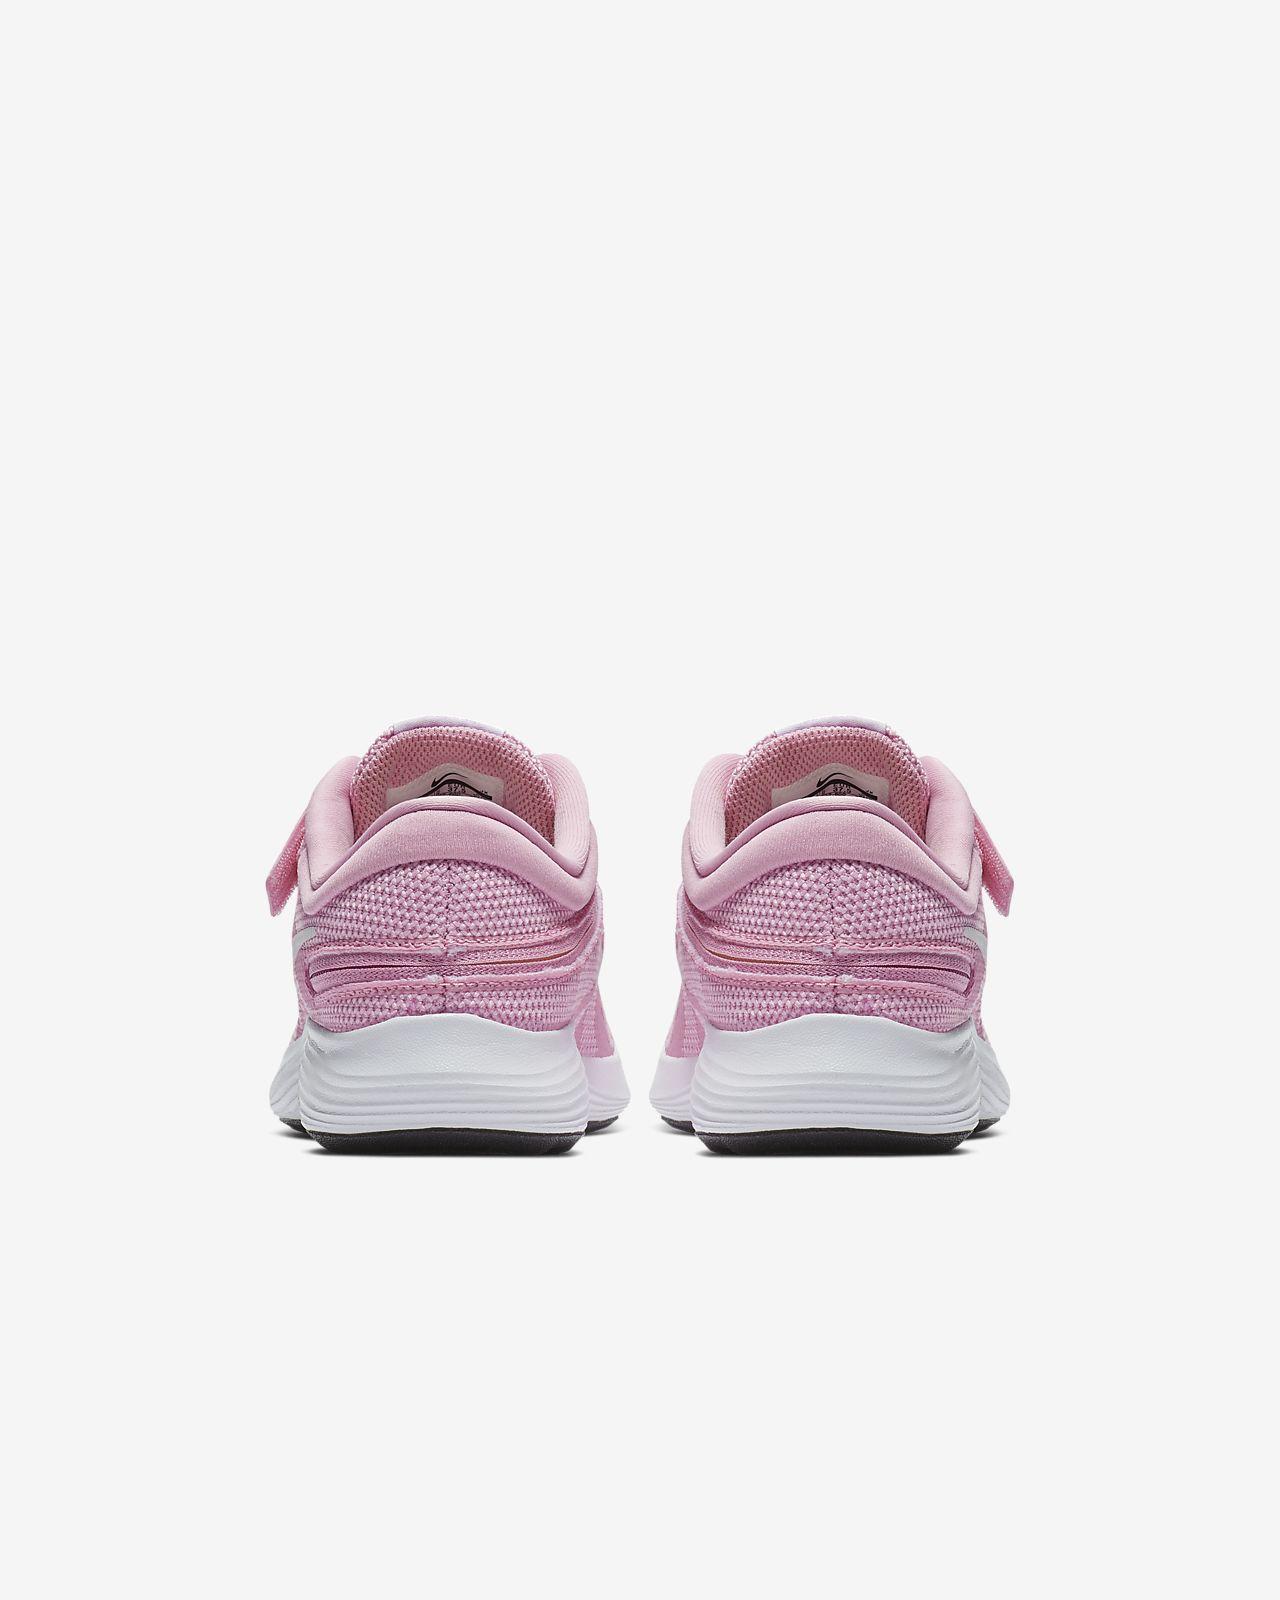 a27a2adf200eb Nike Revolution 4 FlyEase Older Kids  Running Shoe. Nike.com AU